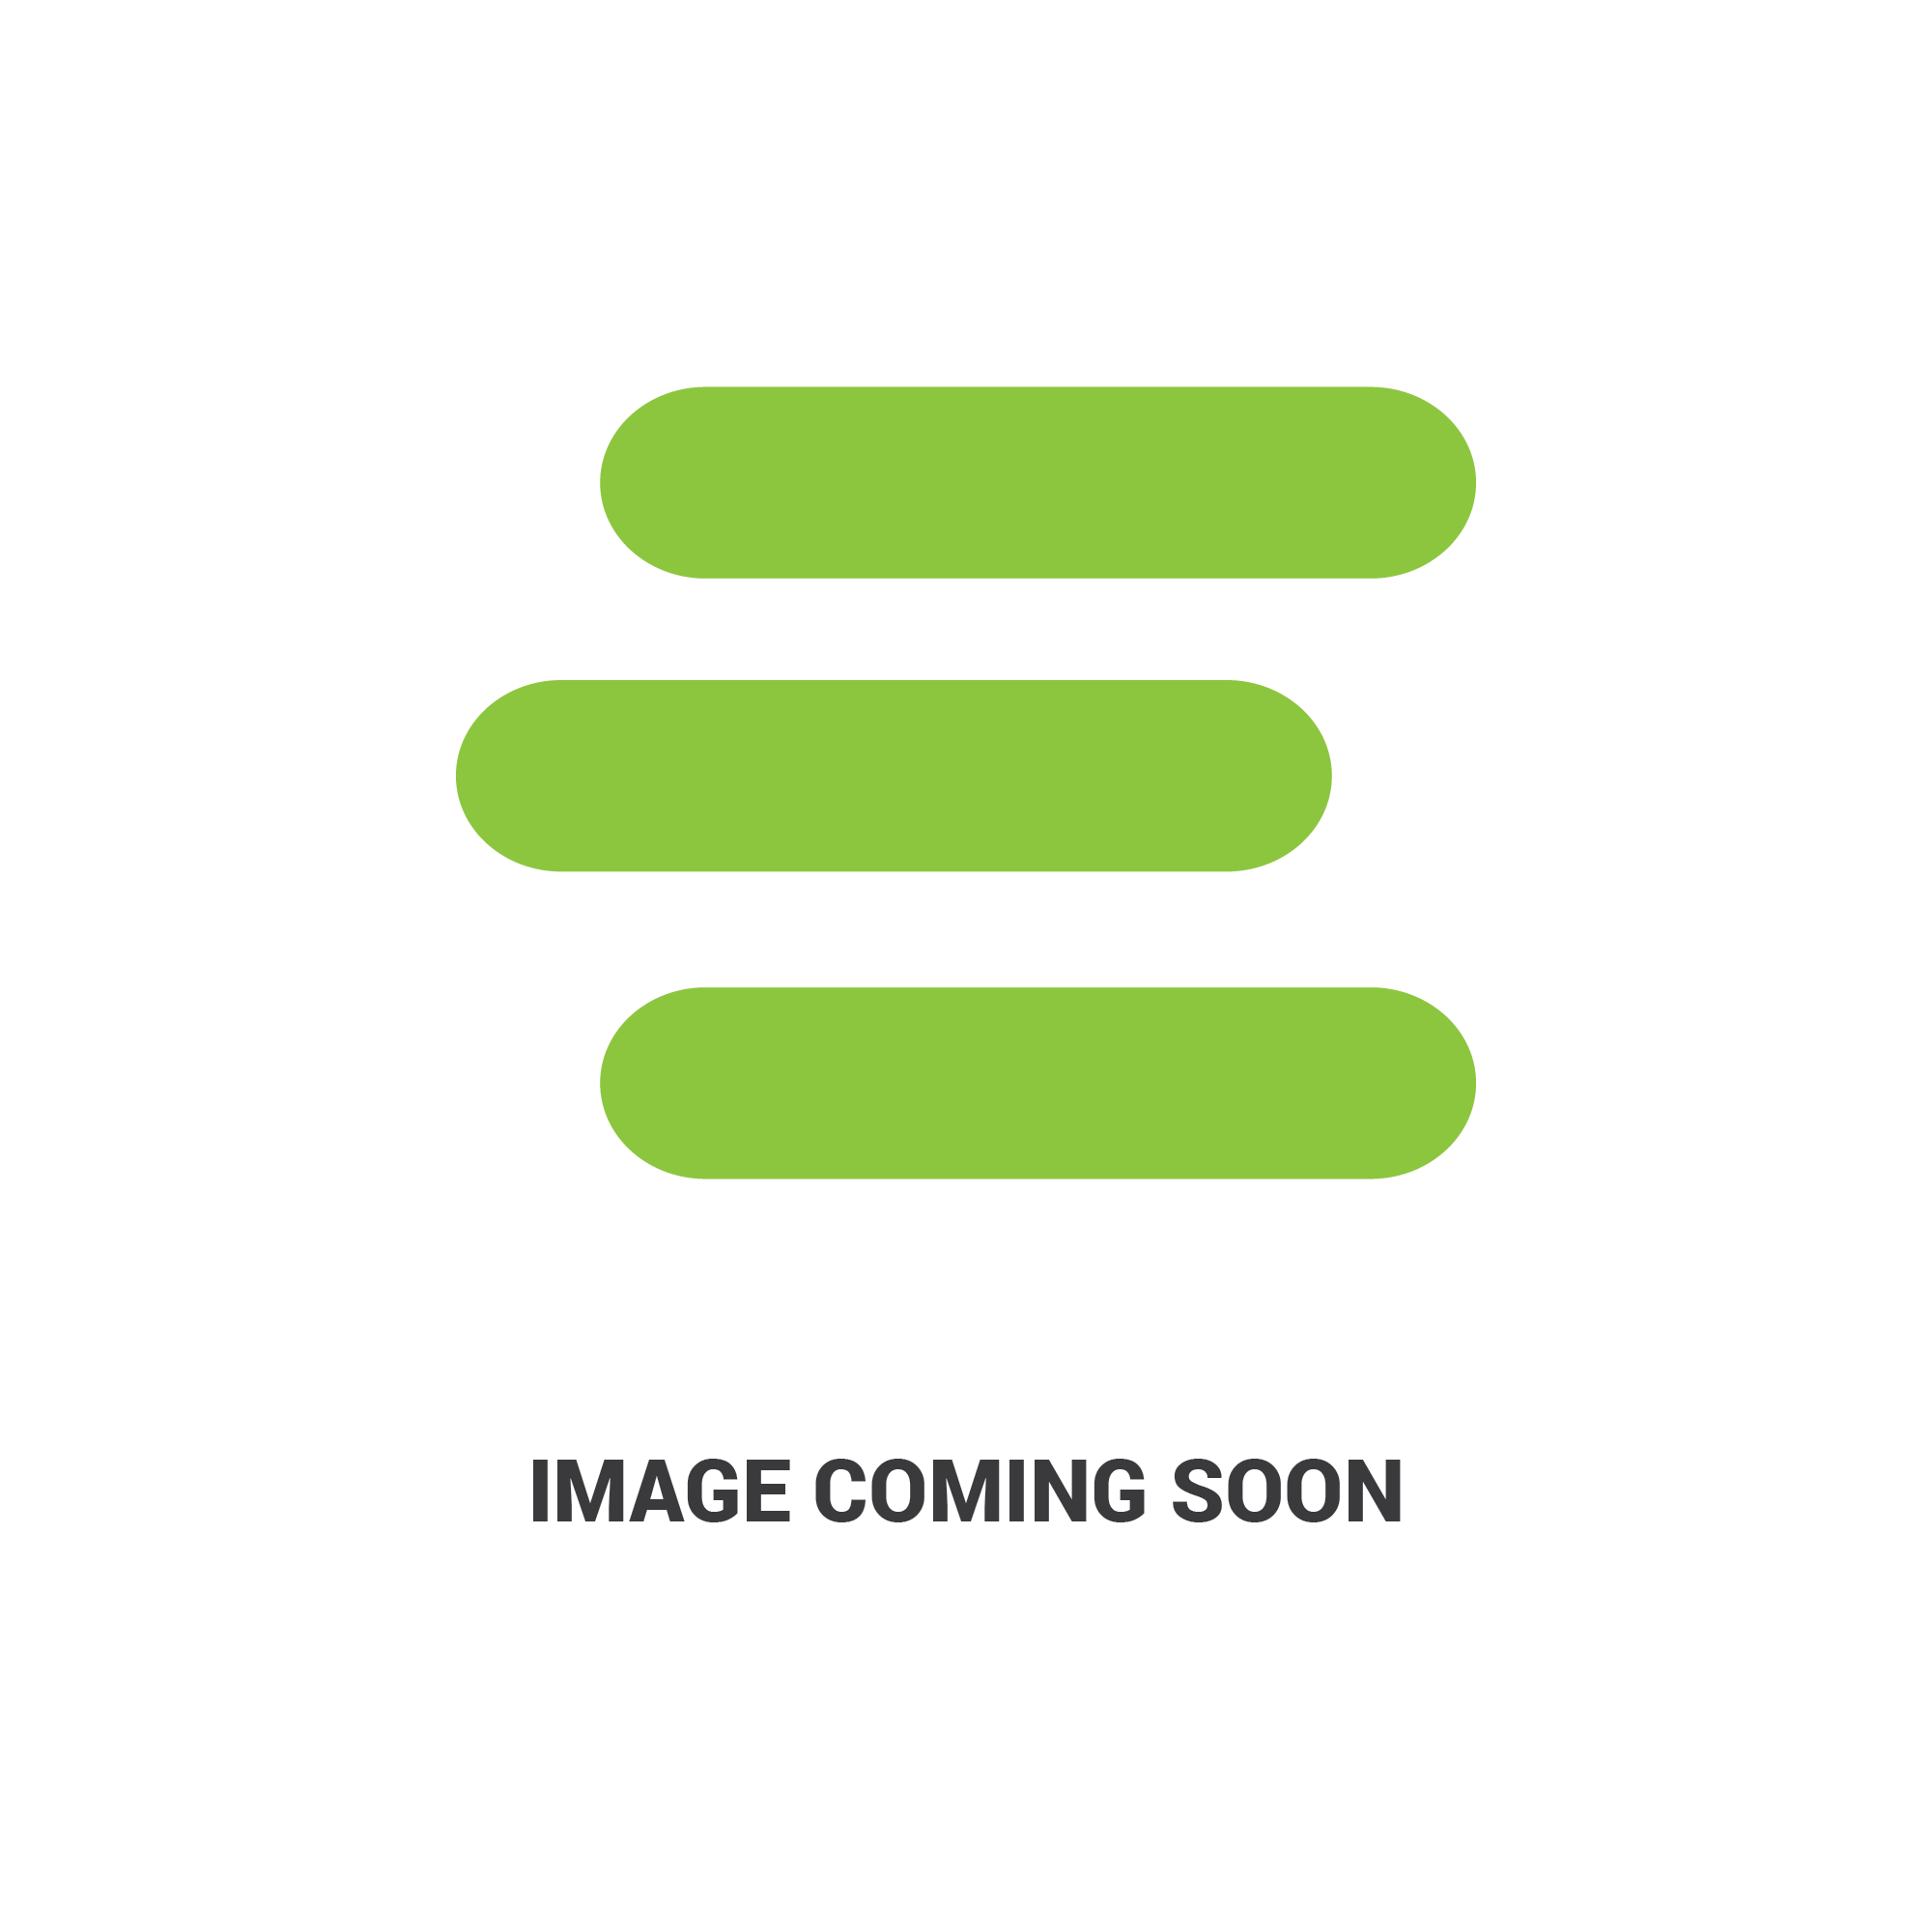 E-6681513edit 1.jpg